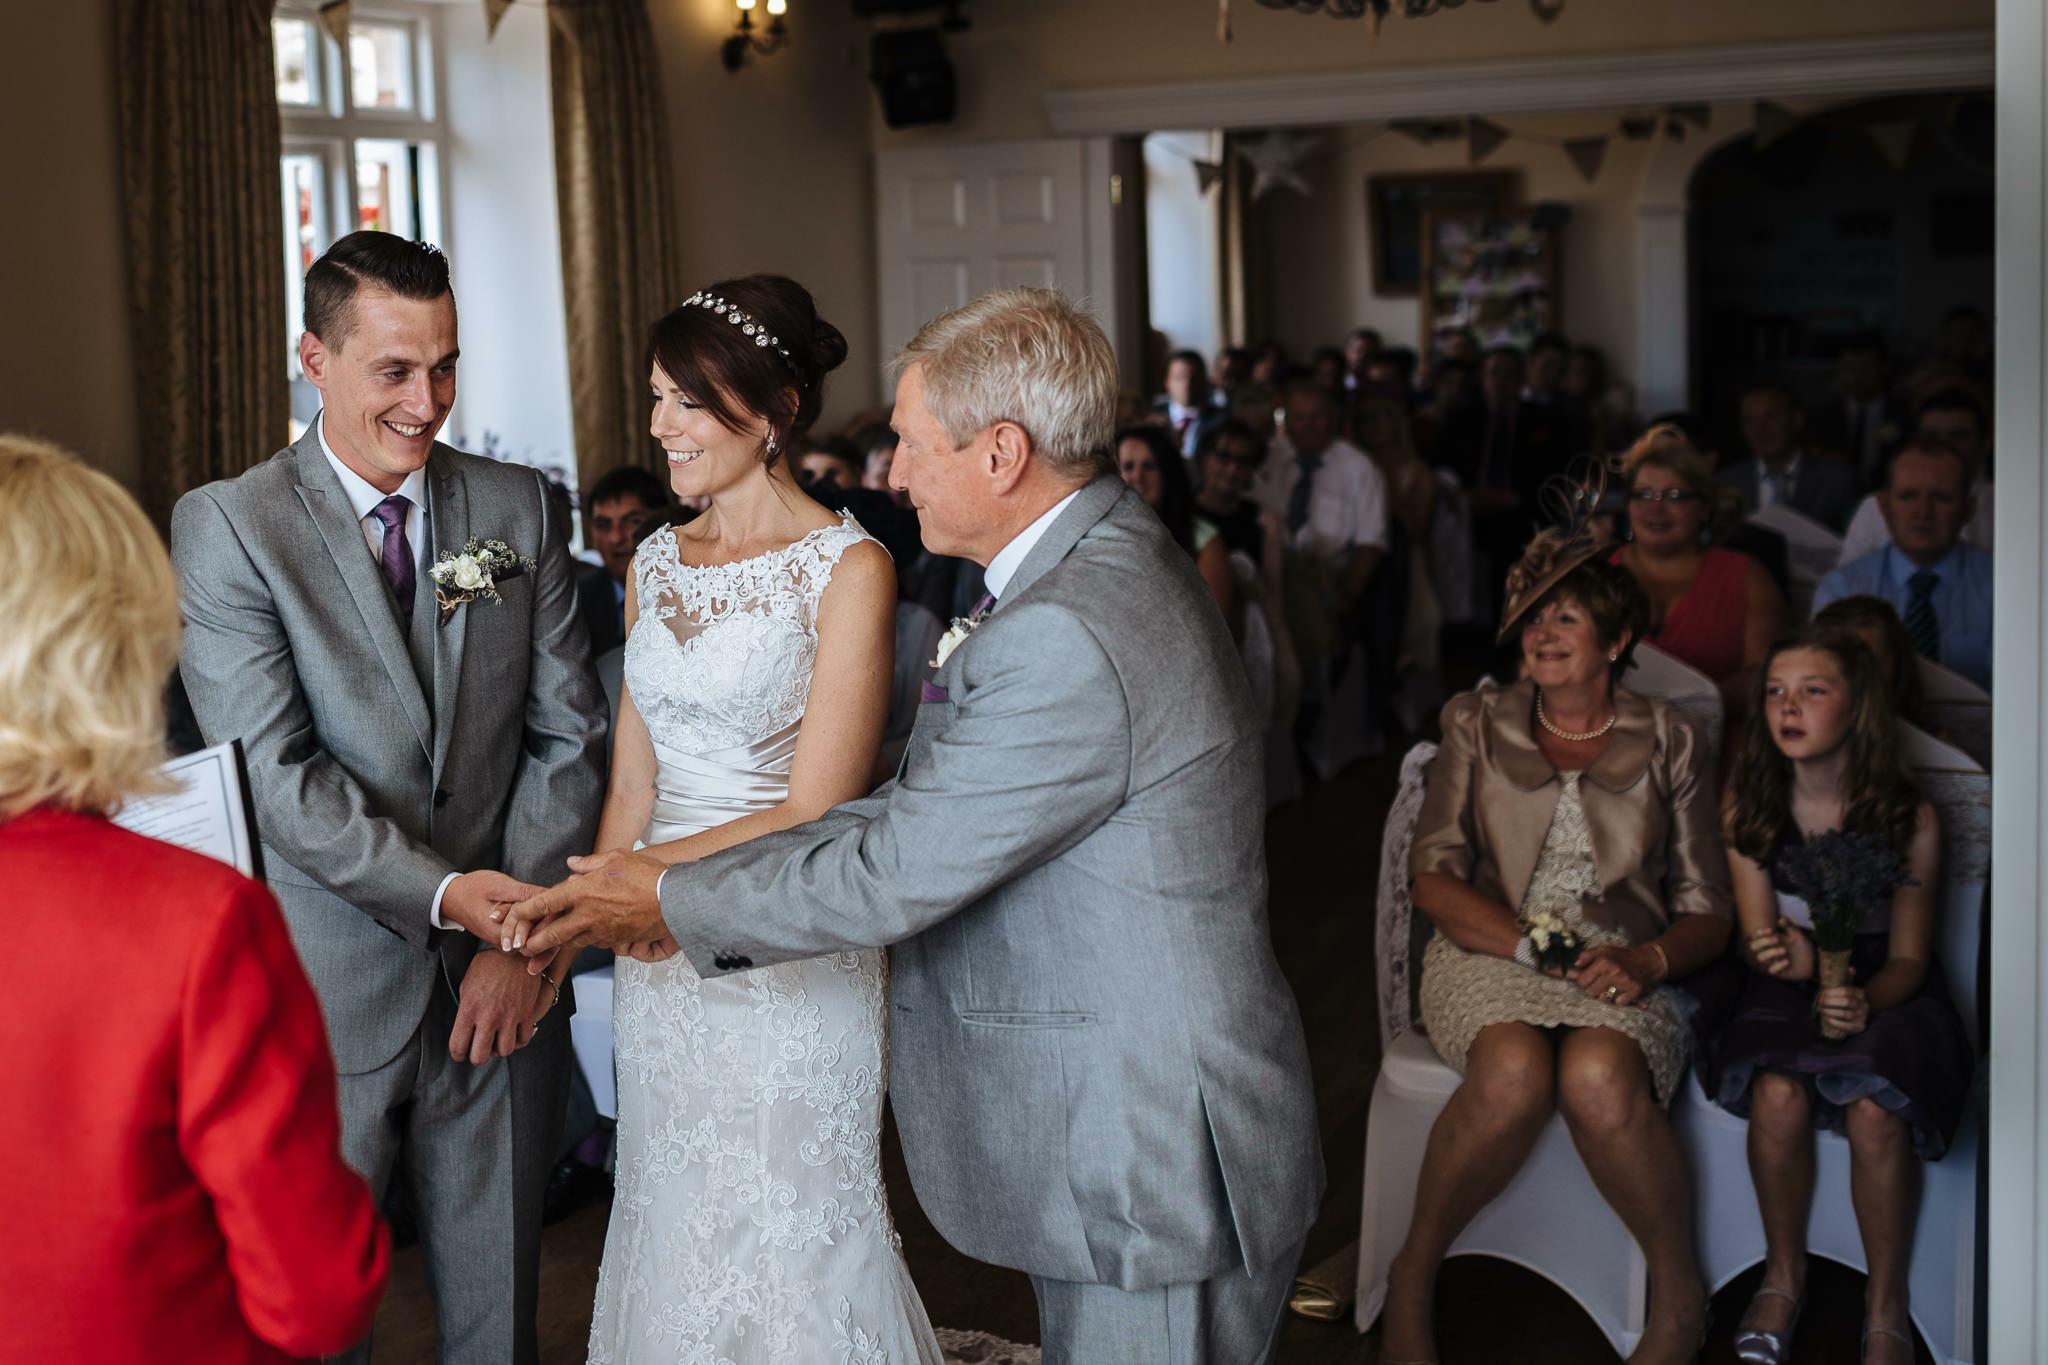 paul-marbrook-Caer-Llan-Wedding-Photographer-90041